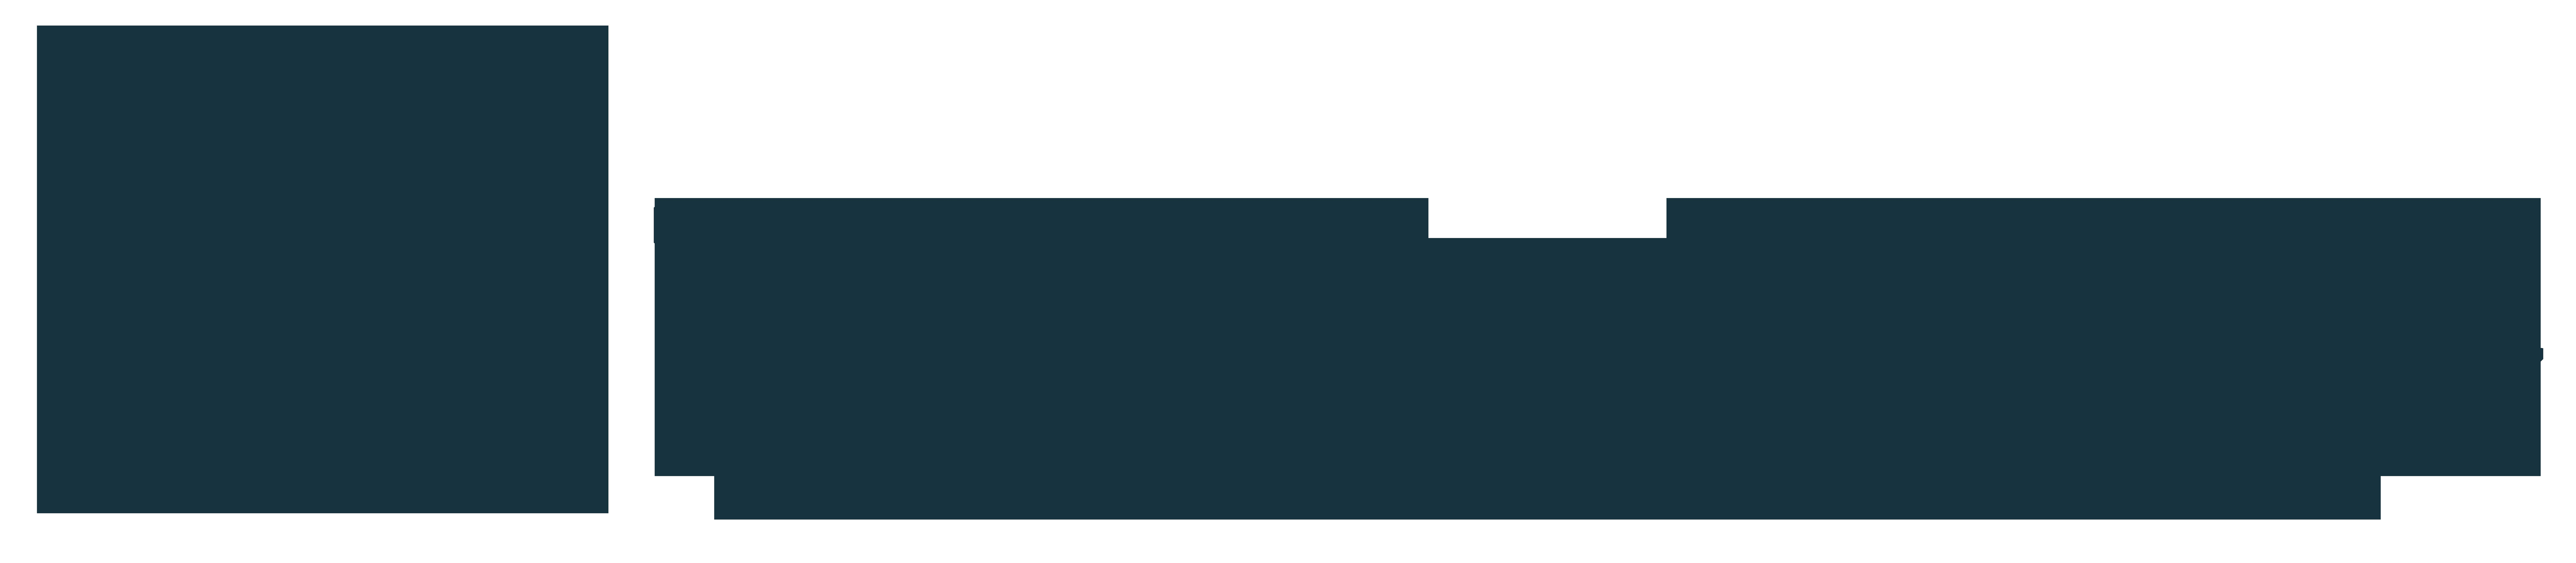 Twin Rivers Capital,Inc